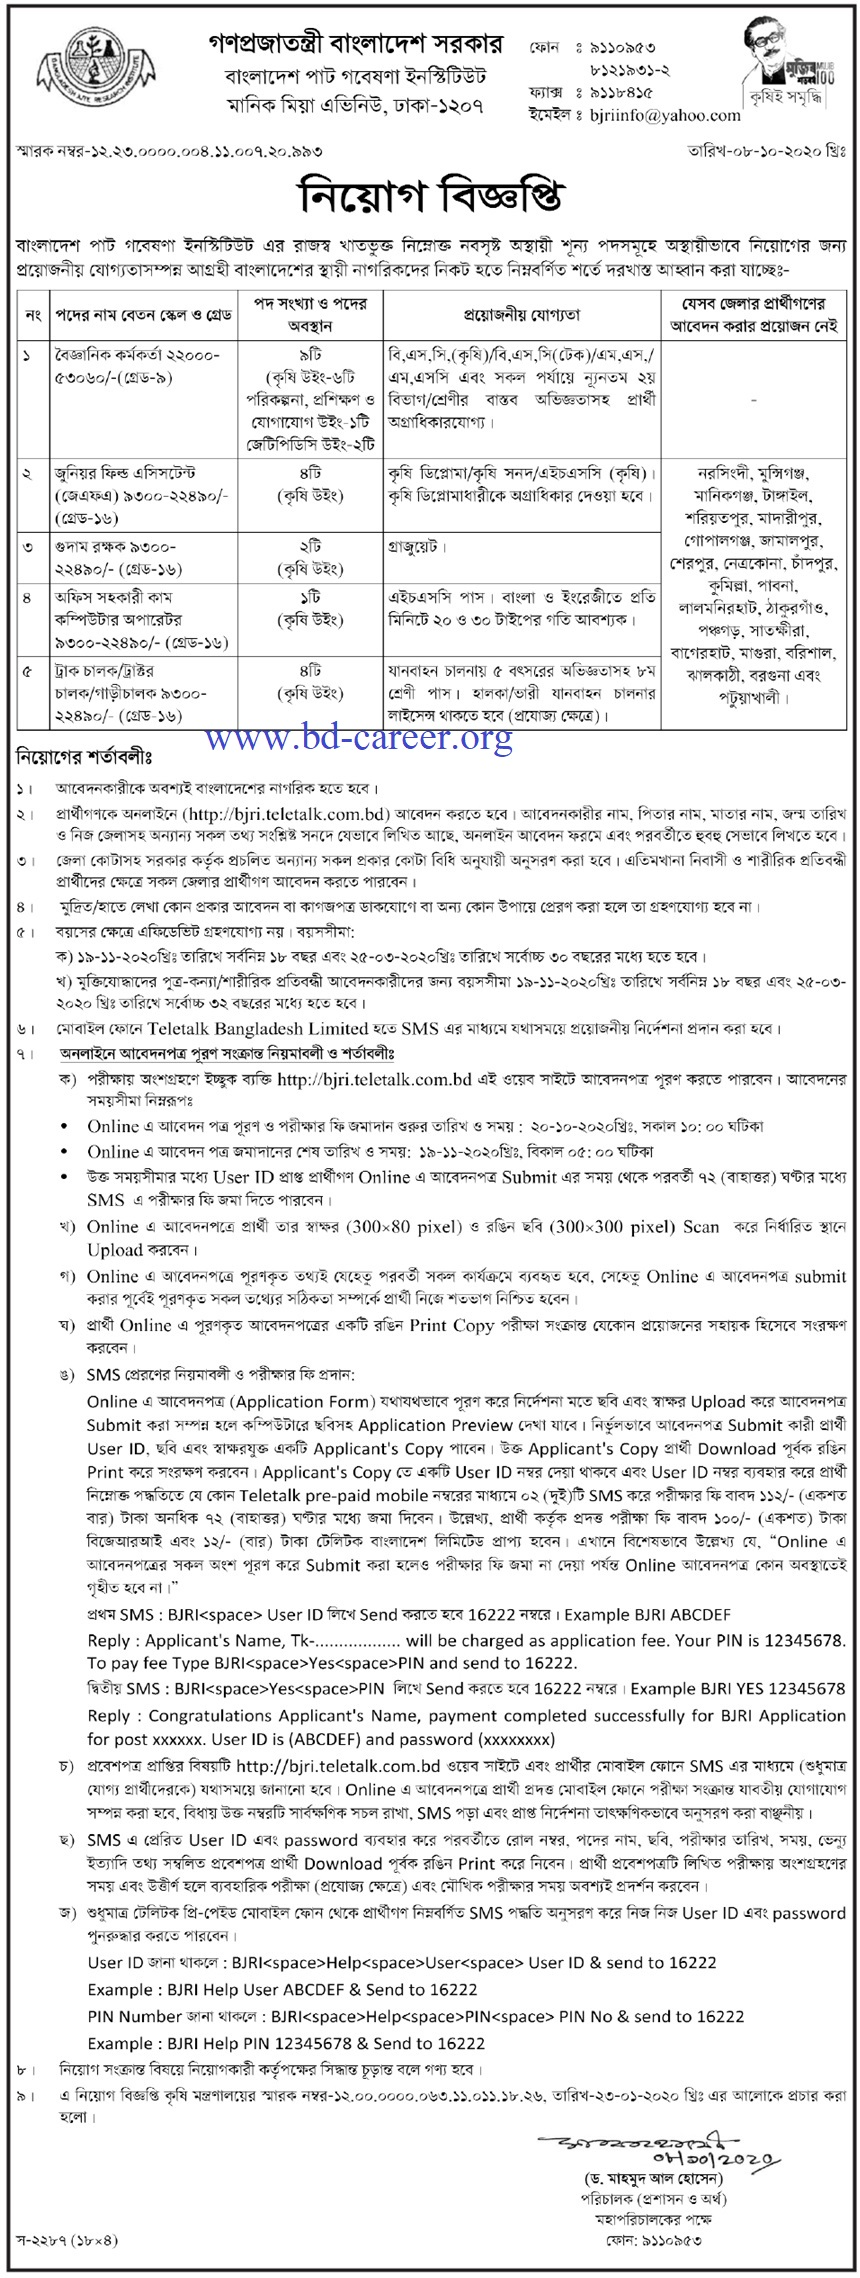 BJRI Teletalk 2020 - bjri.teletalk.com.bd